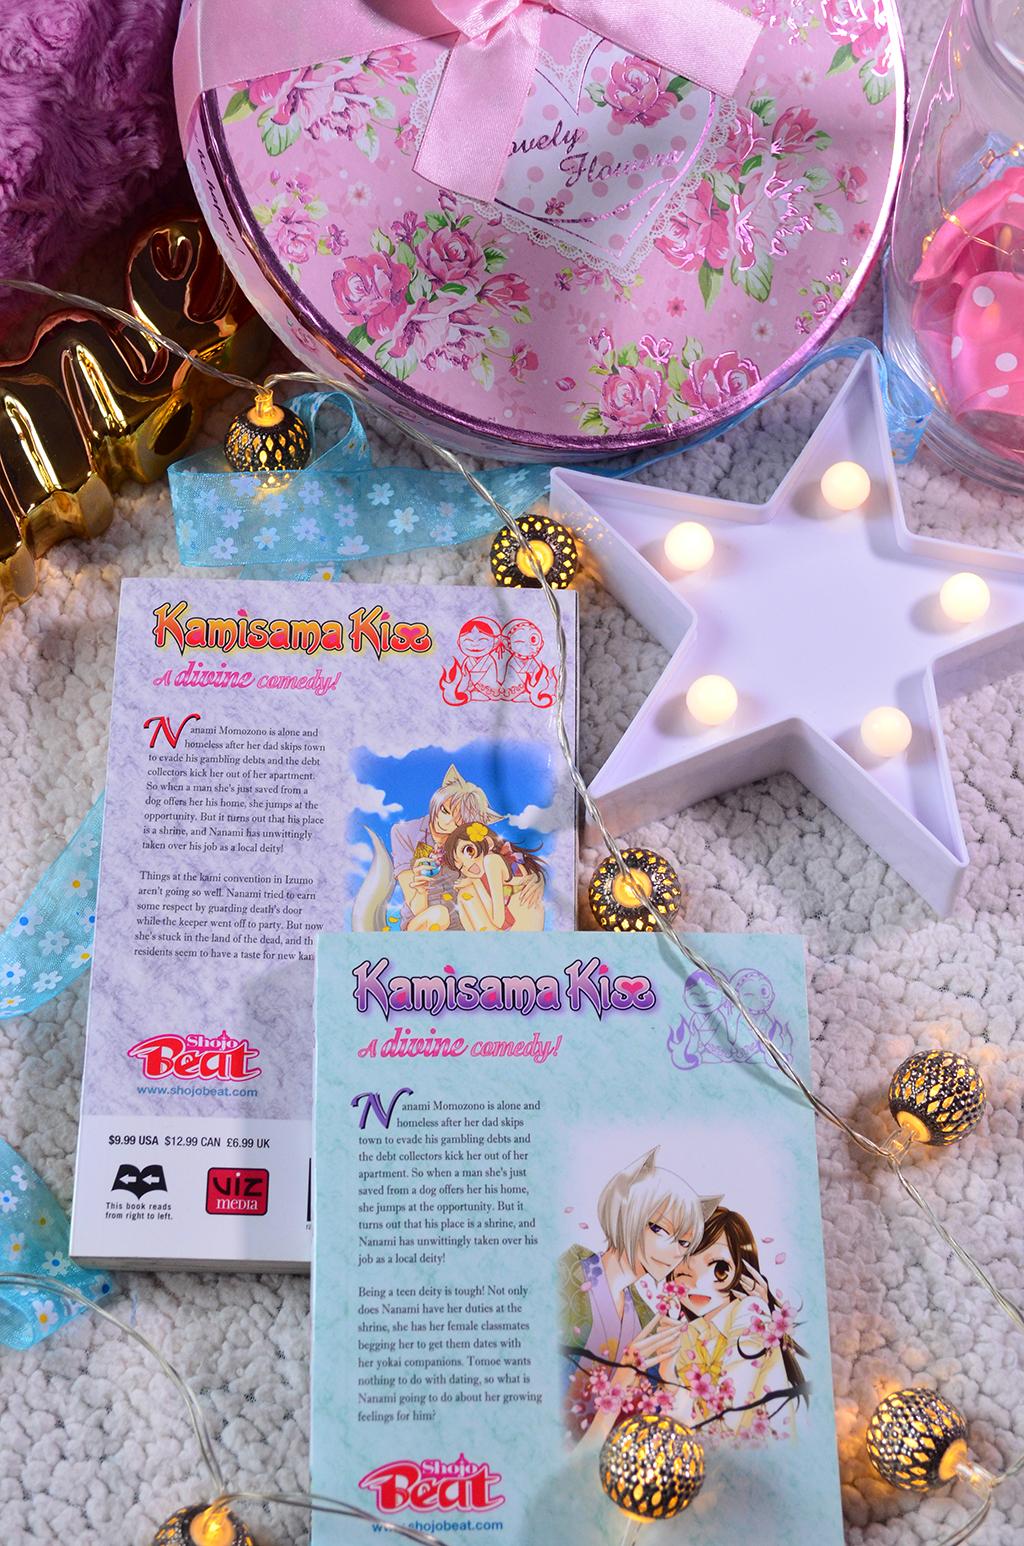 book before bedtime 3 carti de citit inainte de culcare books express manga kamisama kiss seraphina rachet hartman